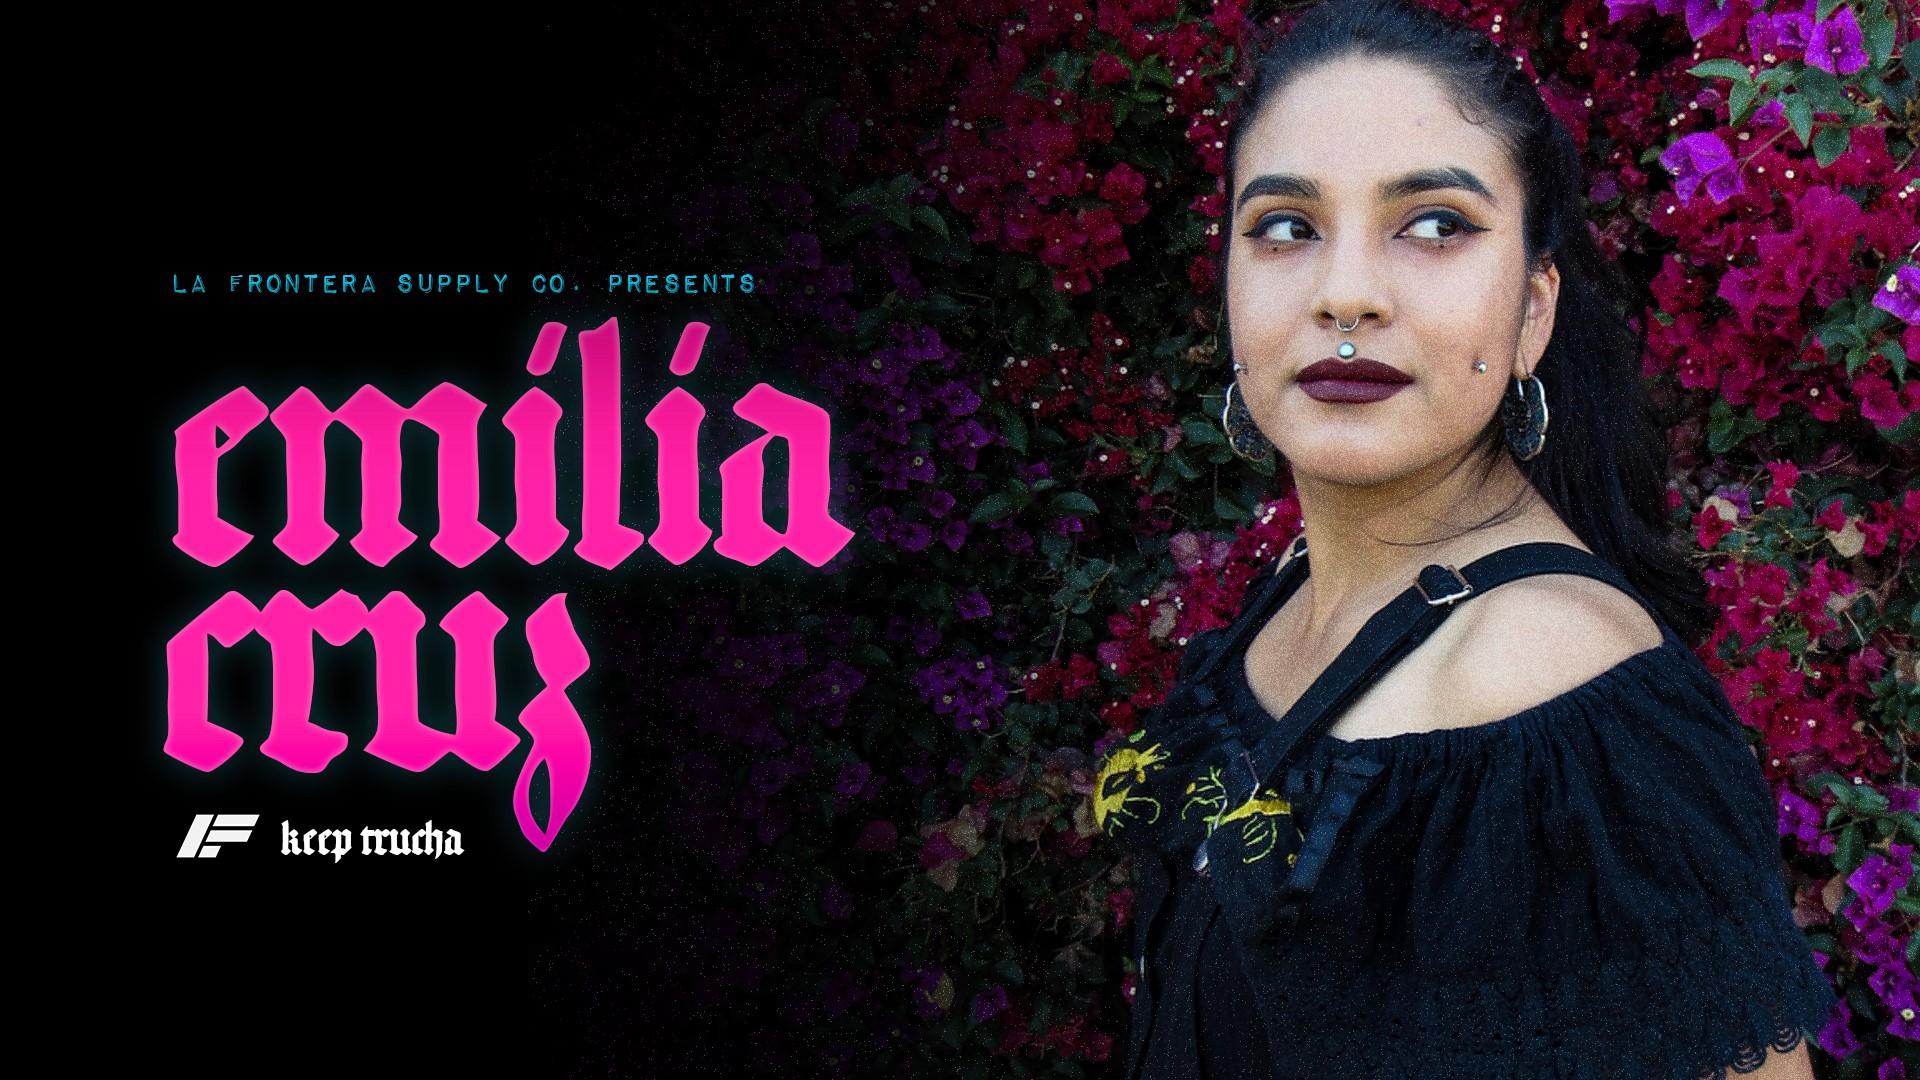 Emilia Cruz: Empowerment and Identification Through Art - Keep Trucha | Episode 005February 26, 2019